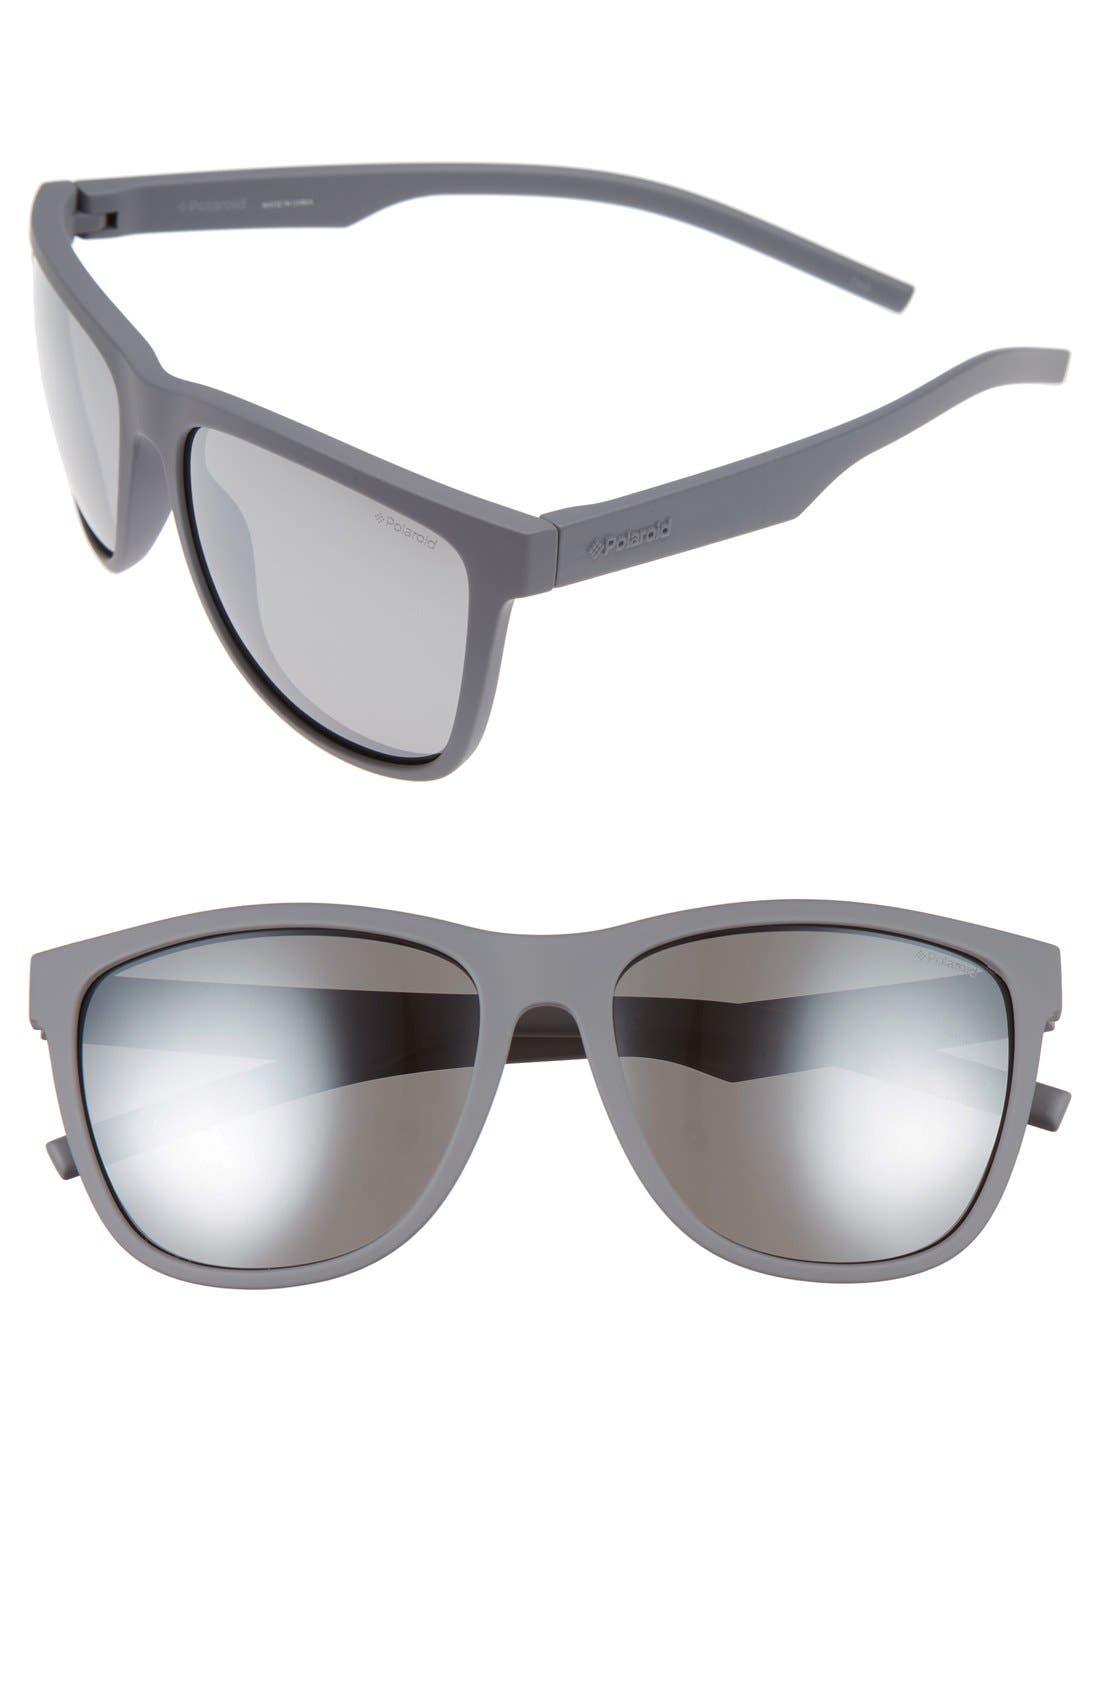 Main Image - Polaroid 6014/S 56mm Polarized Sunglasses